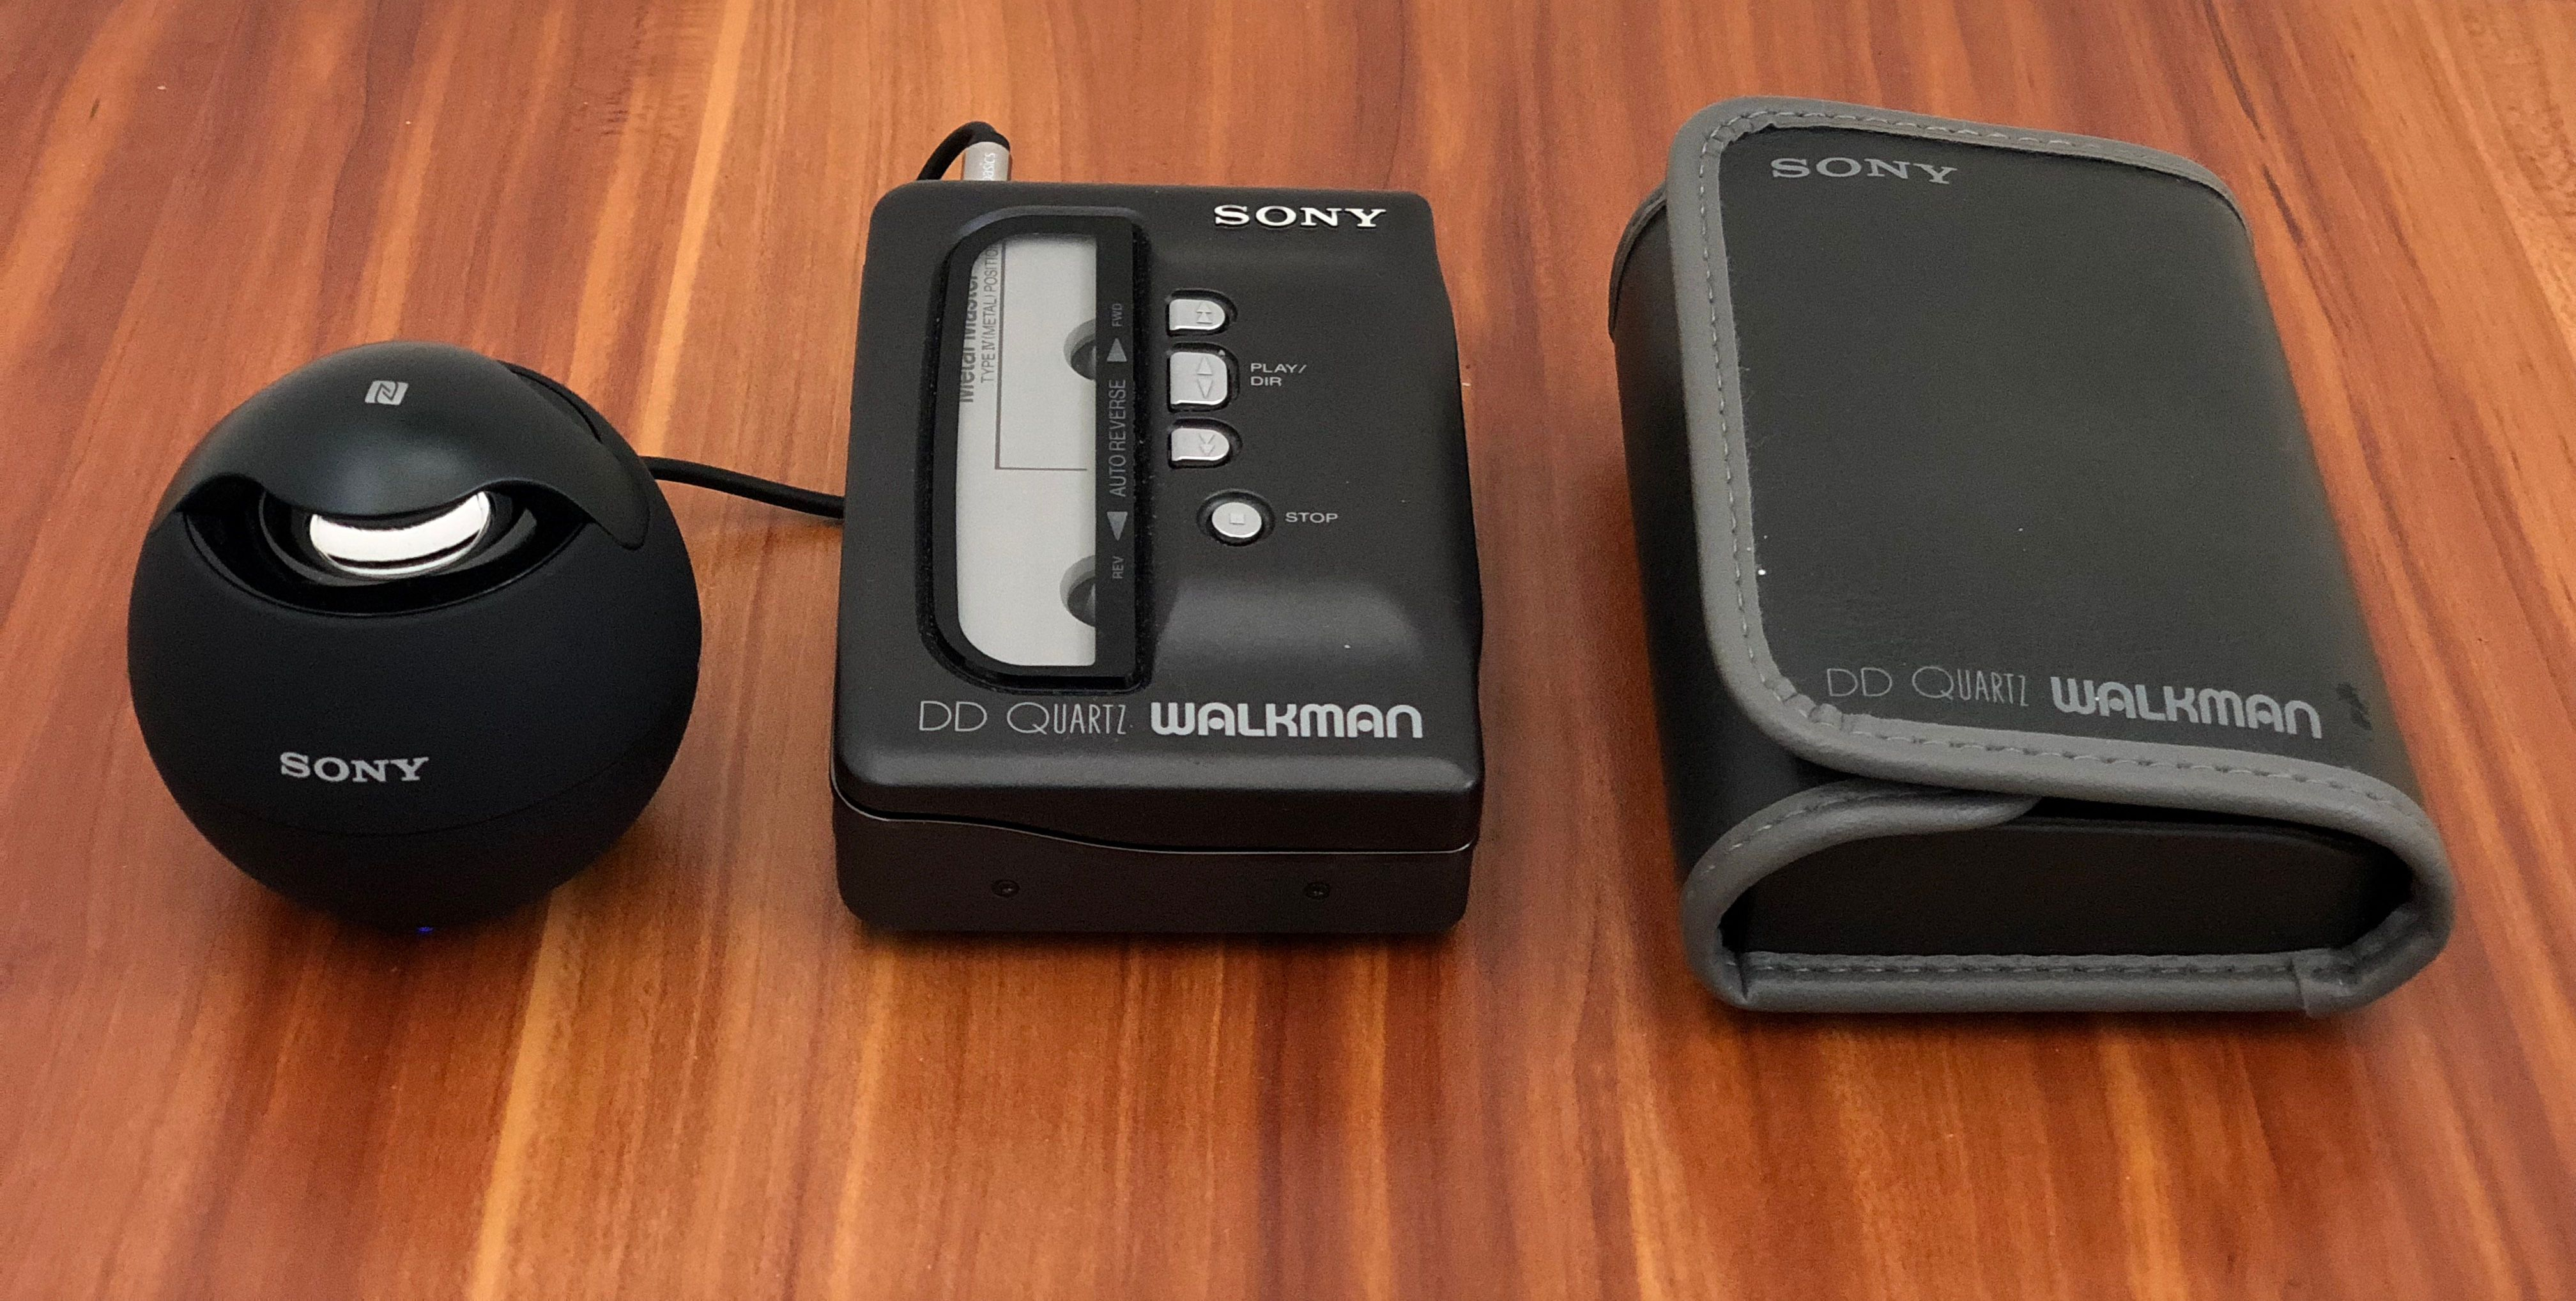 Wm Dd9 Professional Walkman Sony Walkman Walkman Portable Music Player